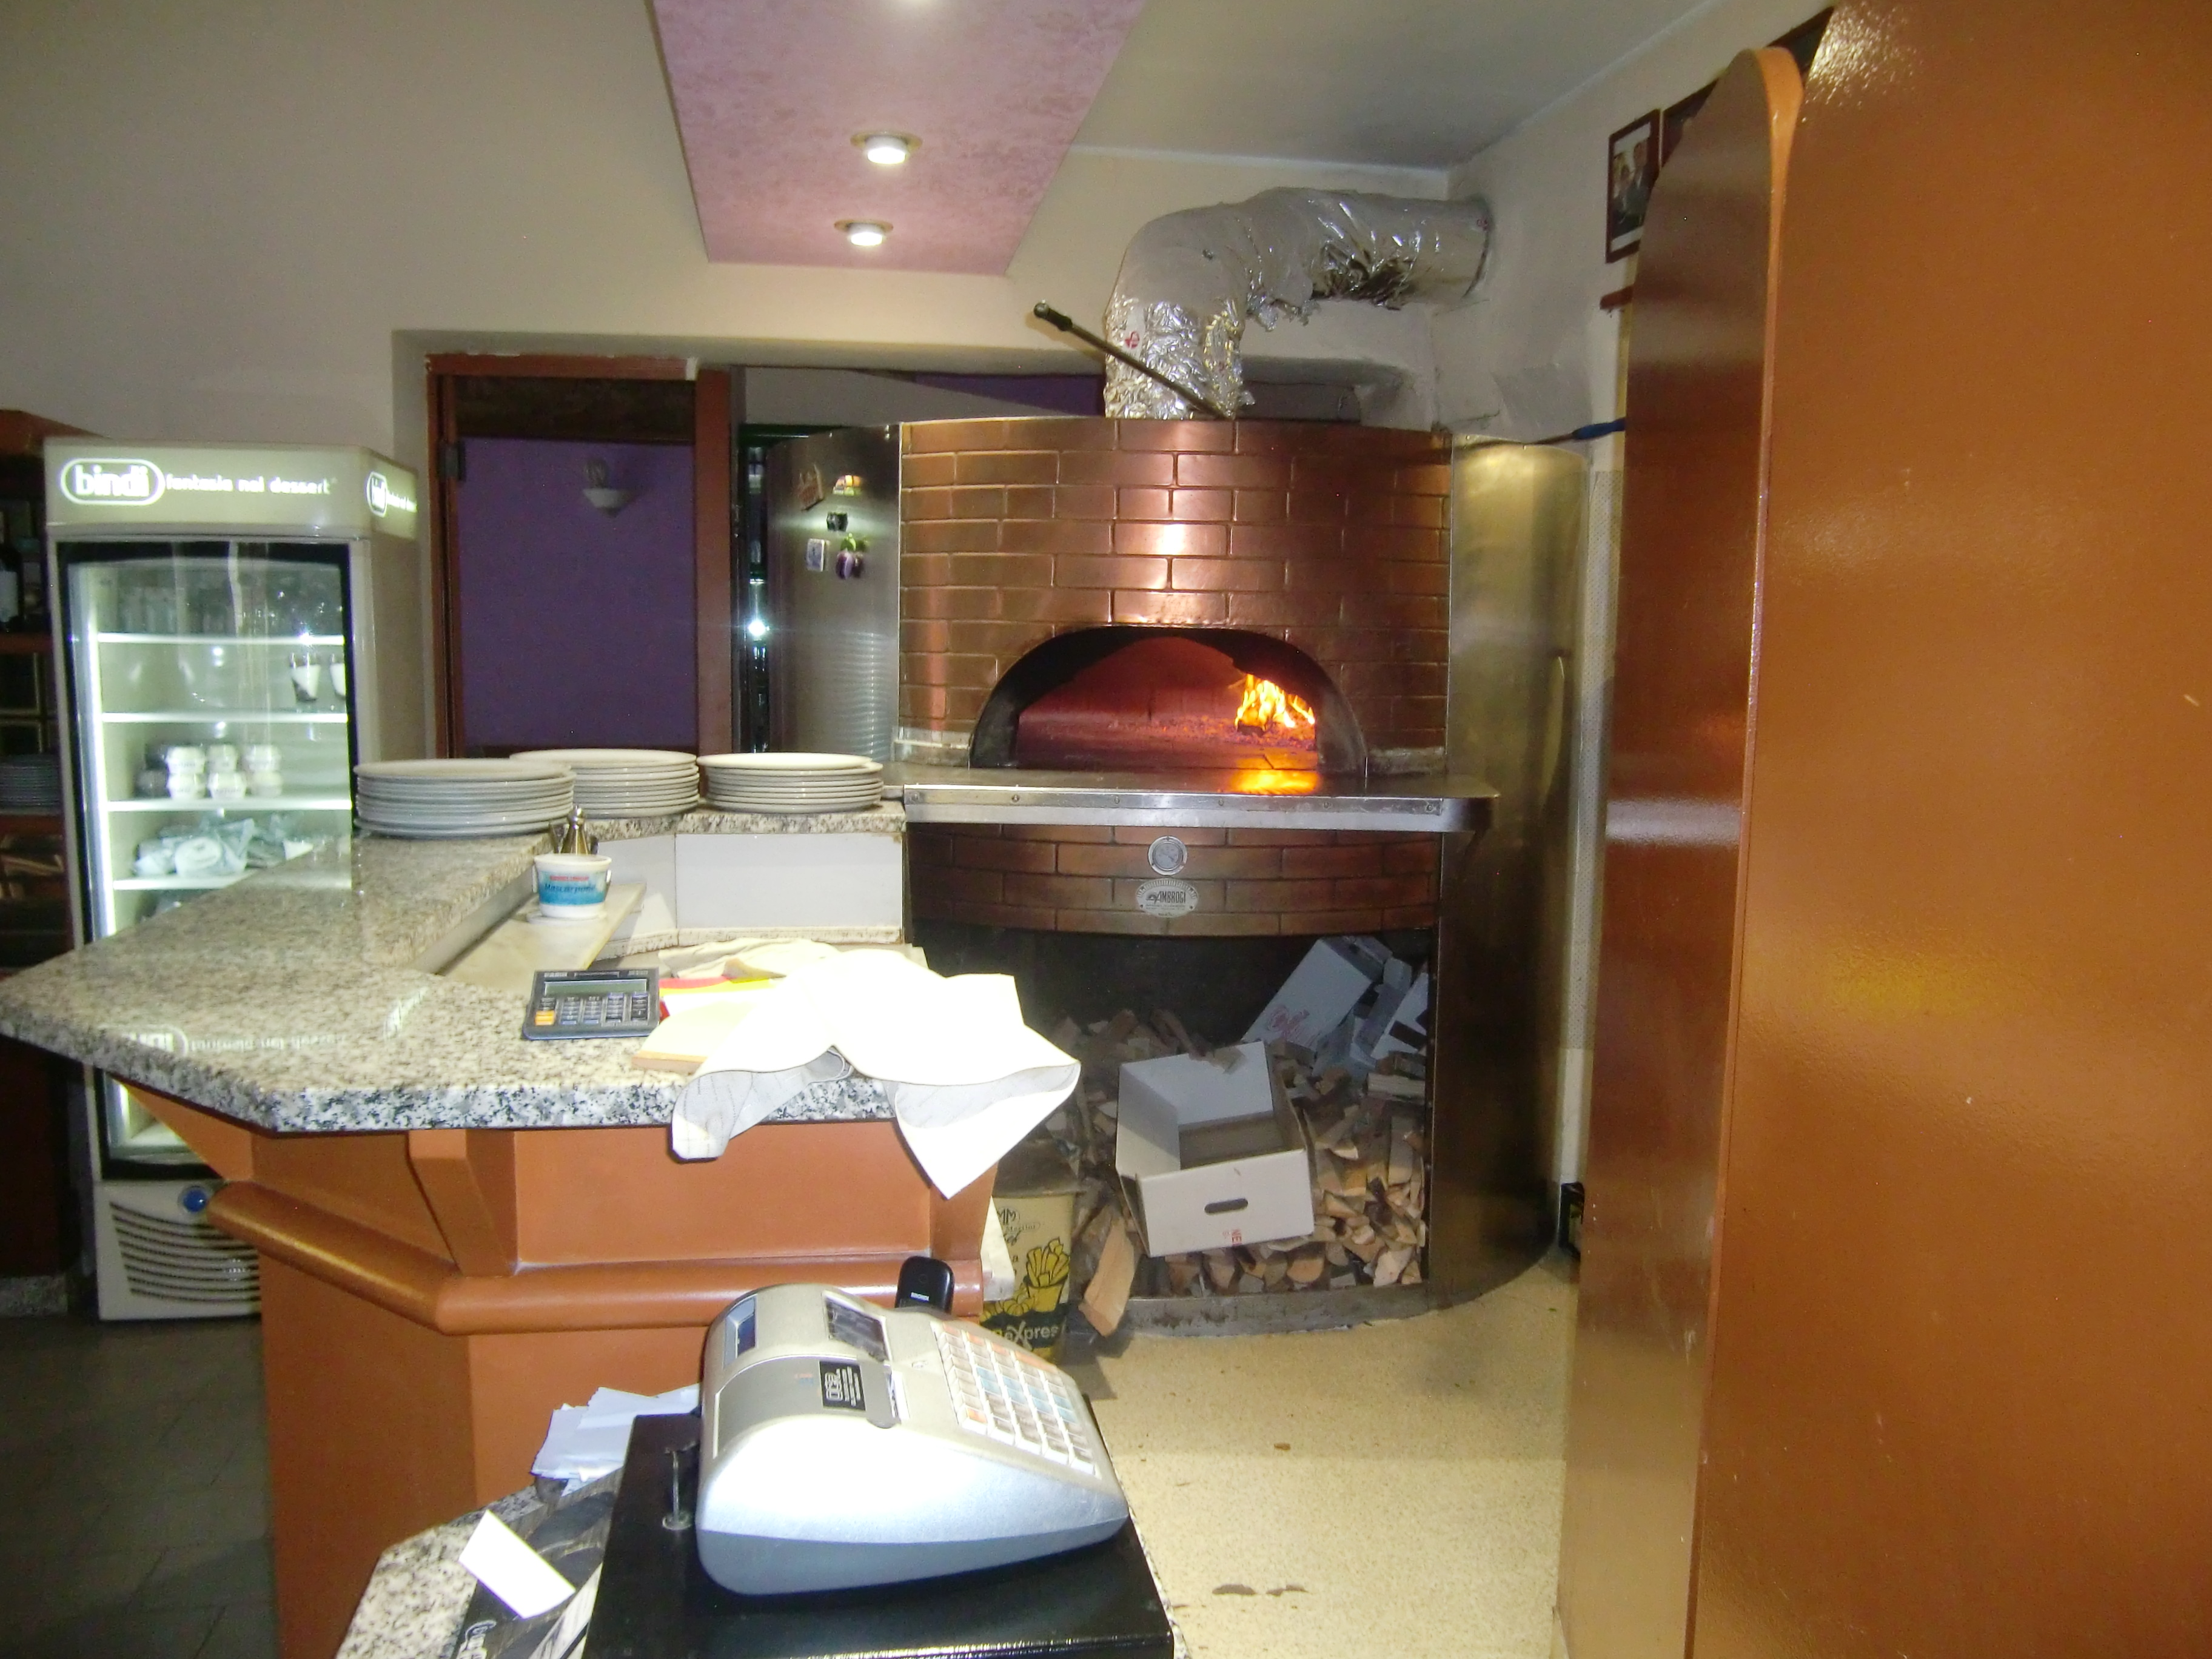 Pizzeria Ristorante Aldo